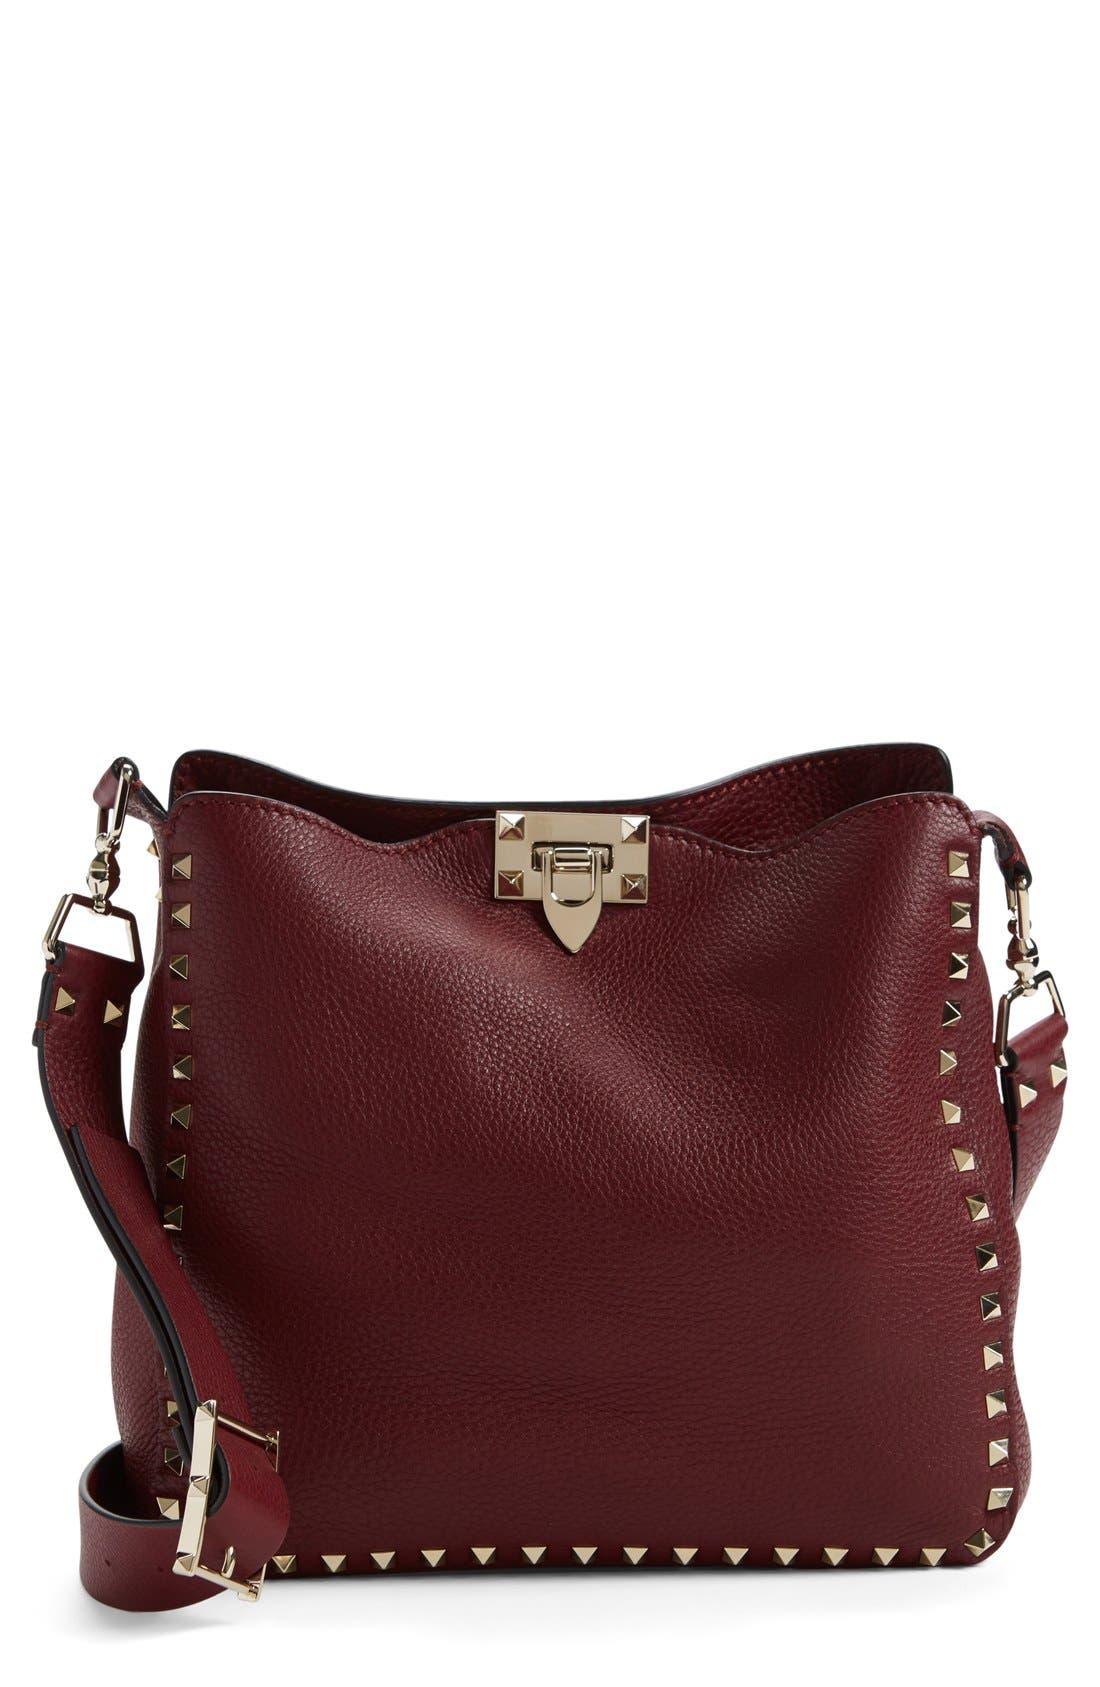 Alternate Image 1 Selected - Valentino 'Small Rockstud' Leather Hobo Bag